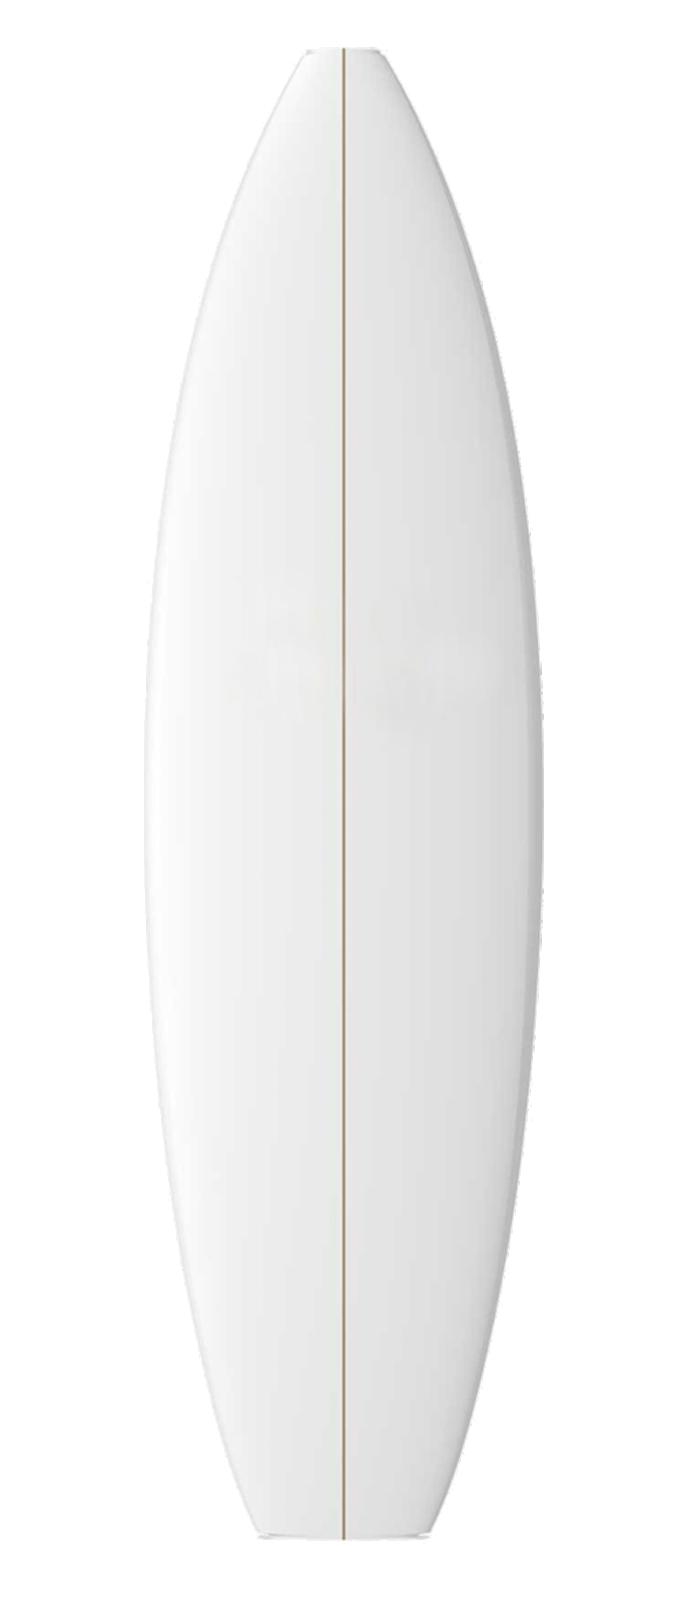 CUSTOM surfboard model